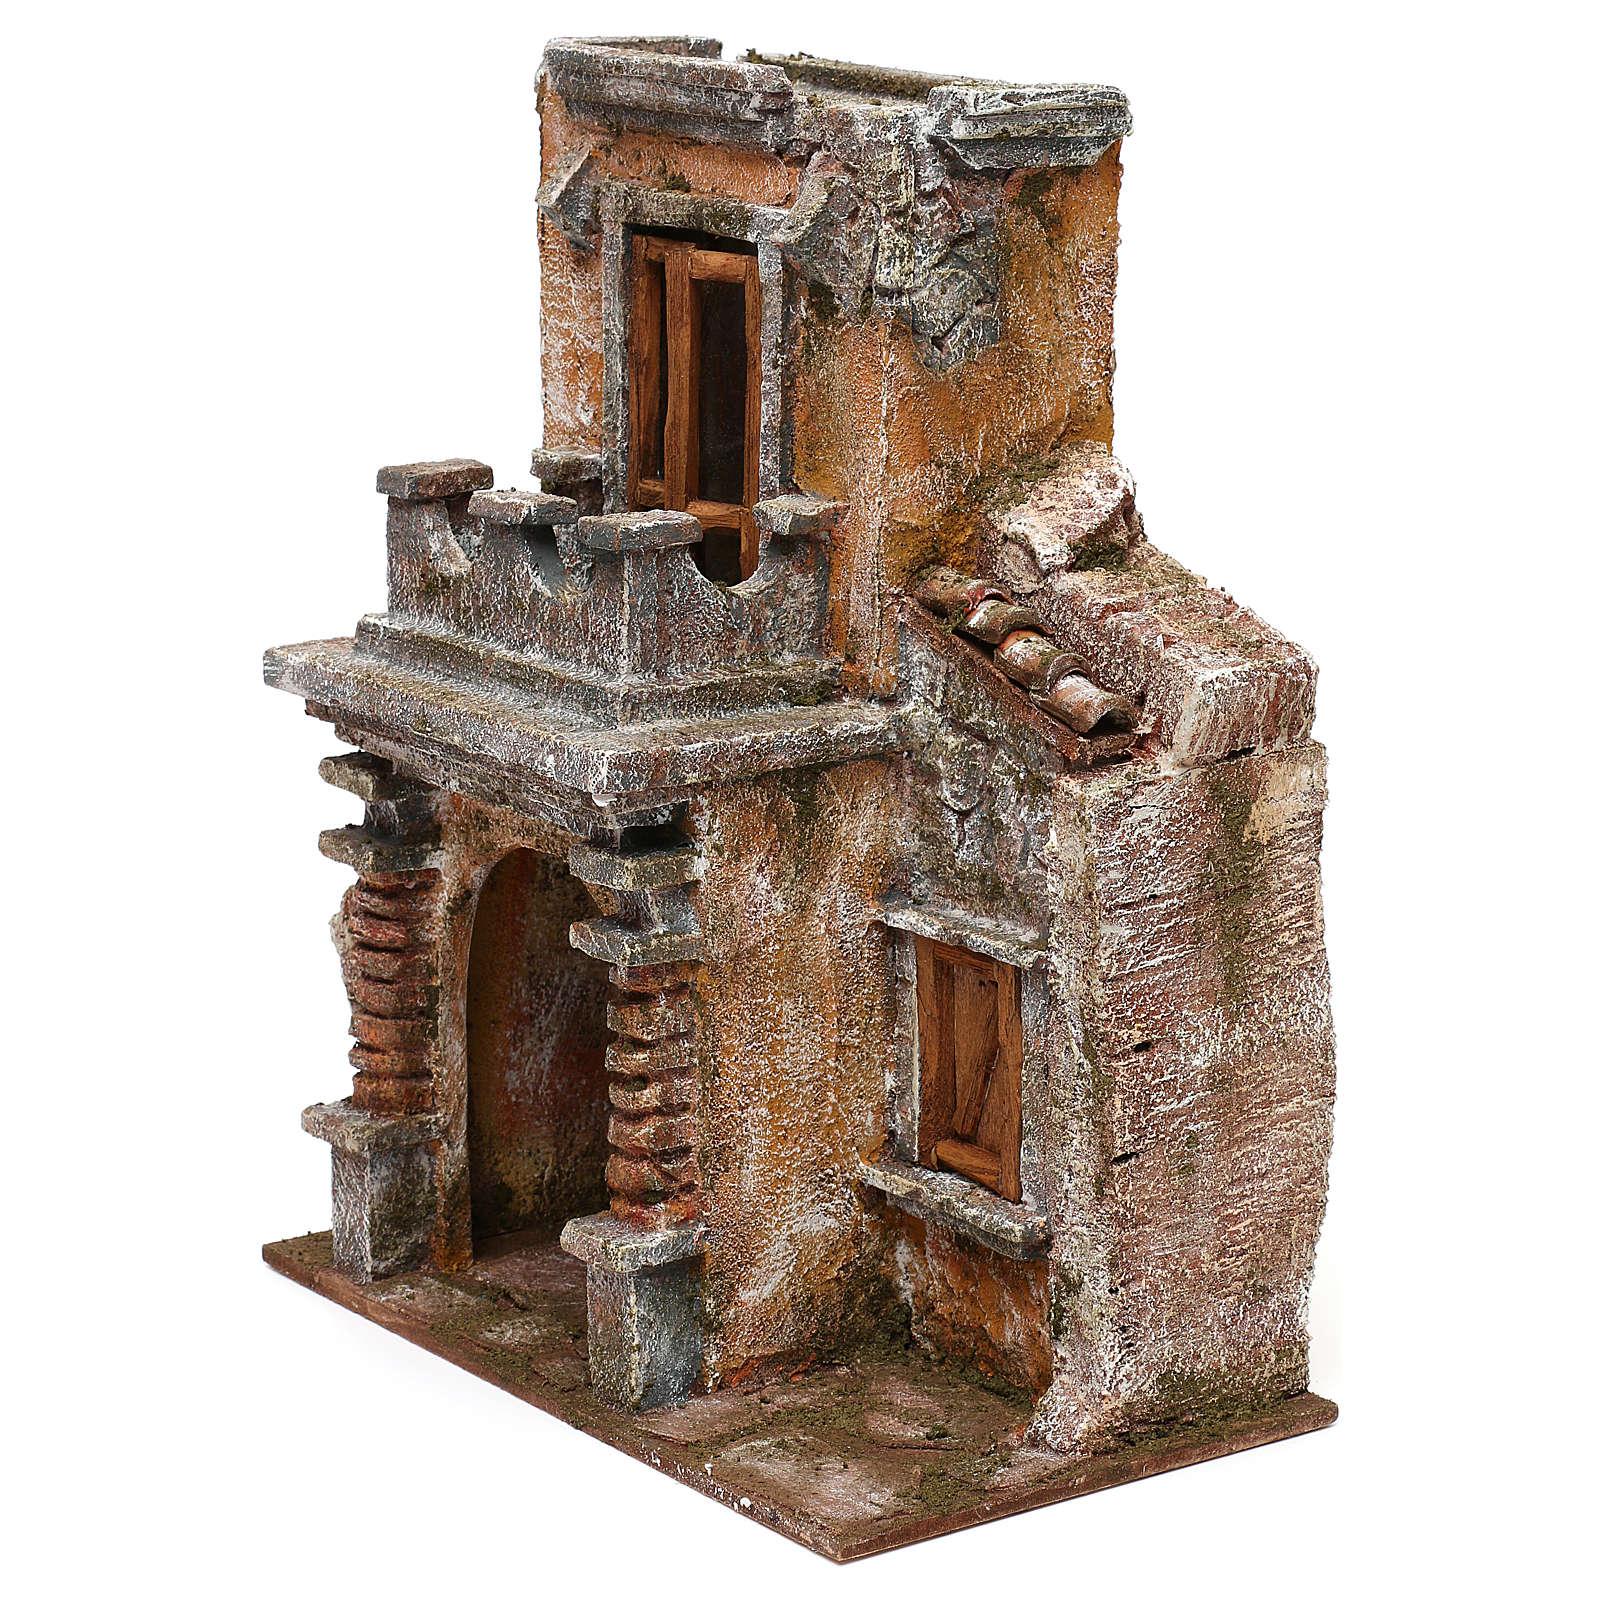 Casa resina con balcone e portico 30x25x15 cm presepi 10 cm 4